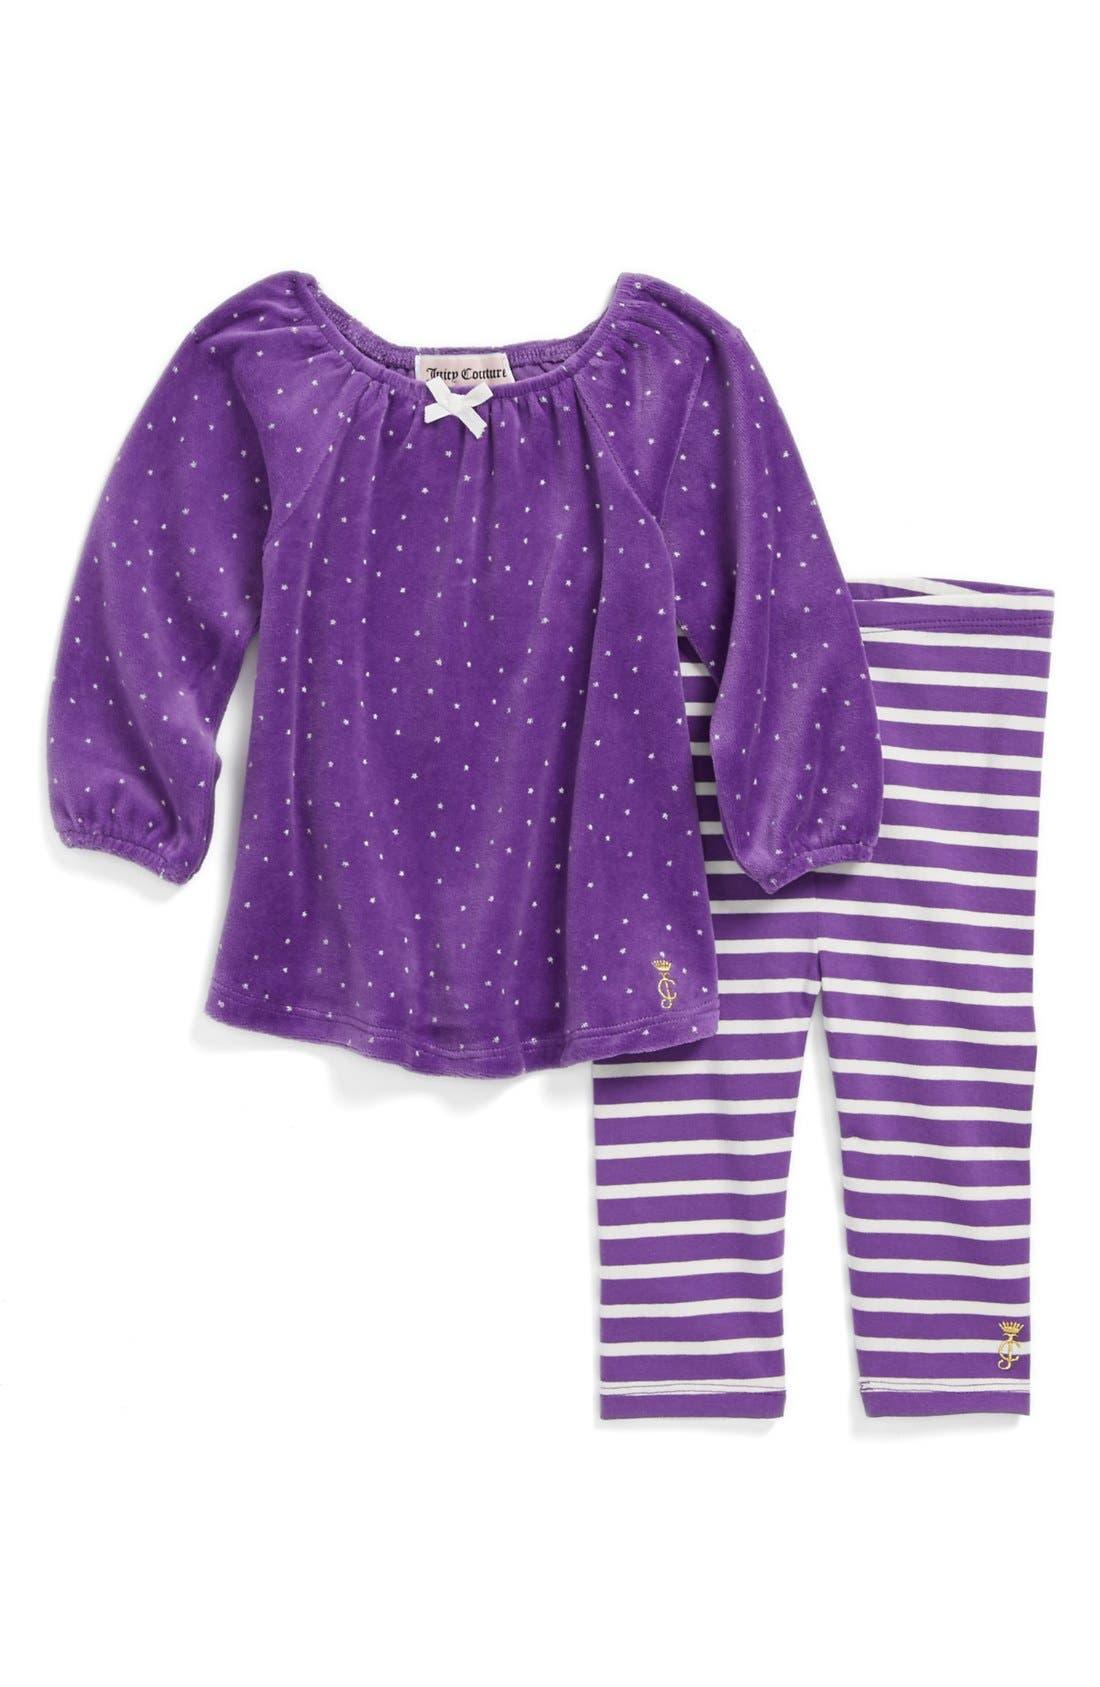 Main Image - Juicy Couture Top & Leggings (Baby Girls)